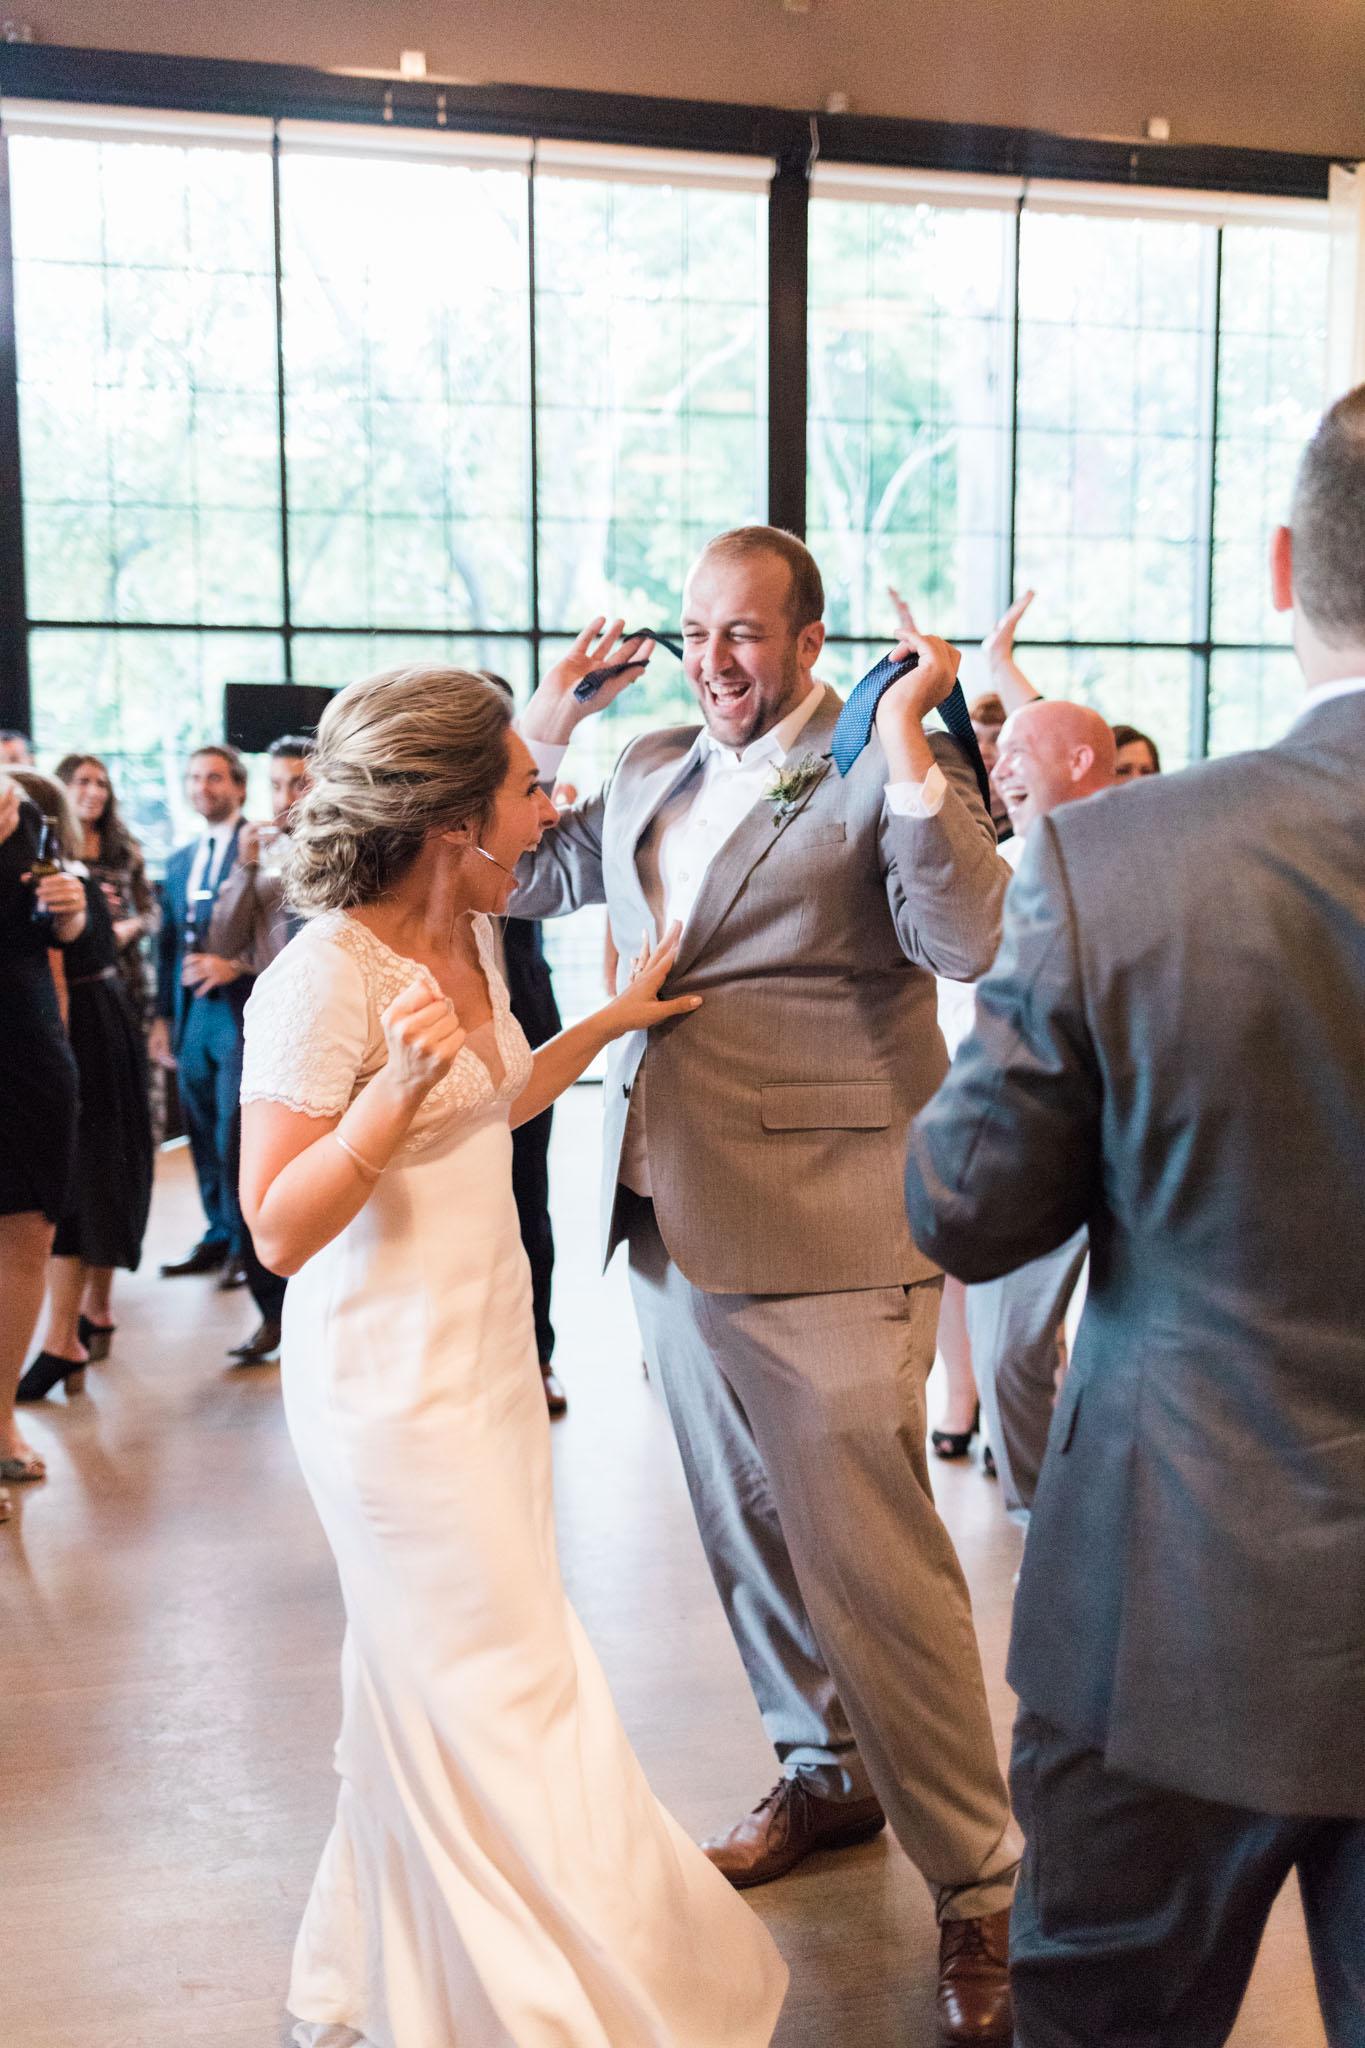 HiloandGinger-Brian+Dina_Weddingday_SneakPeek-60.jpg